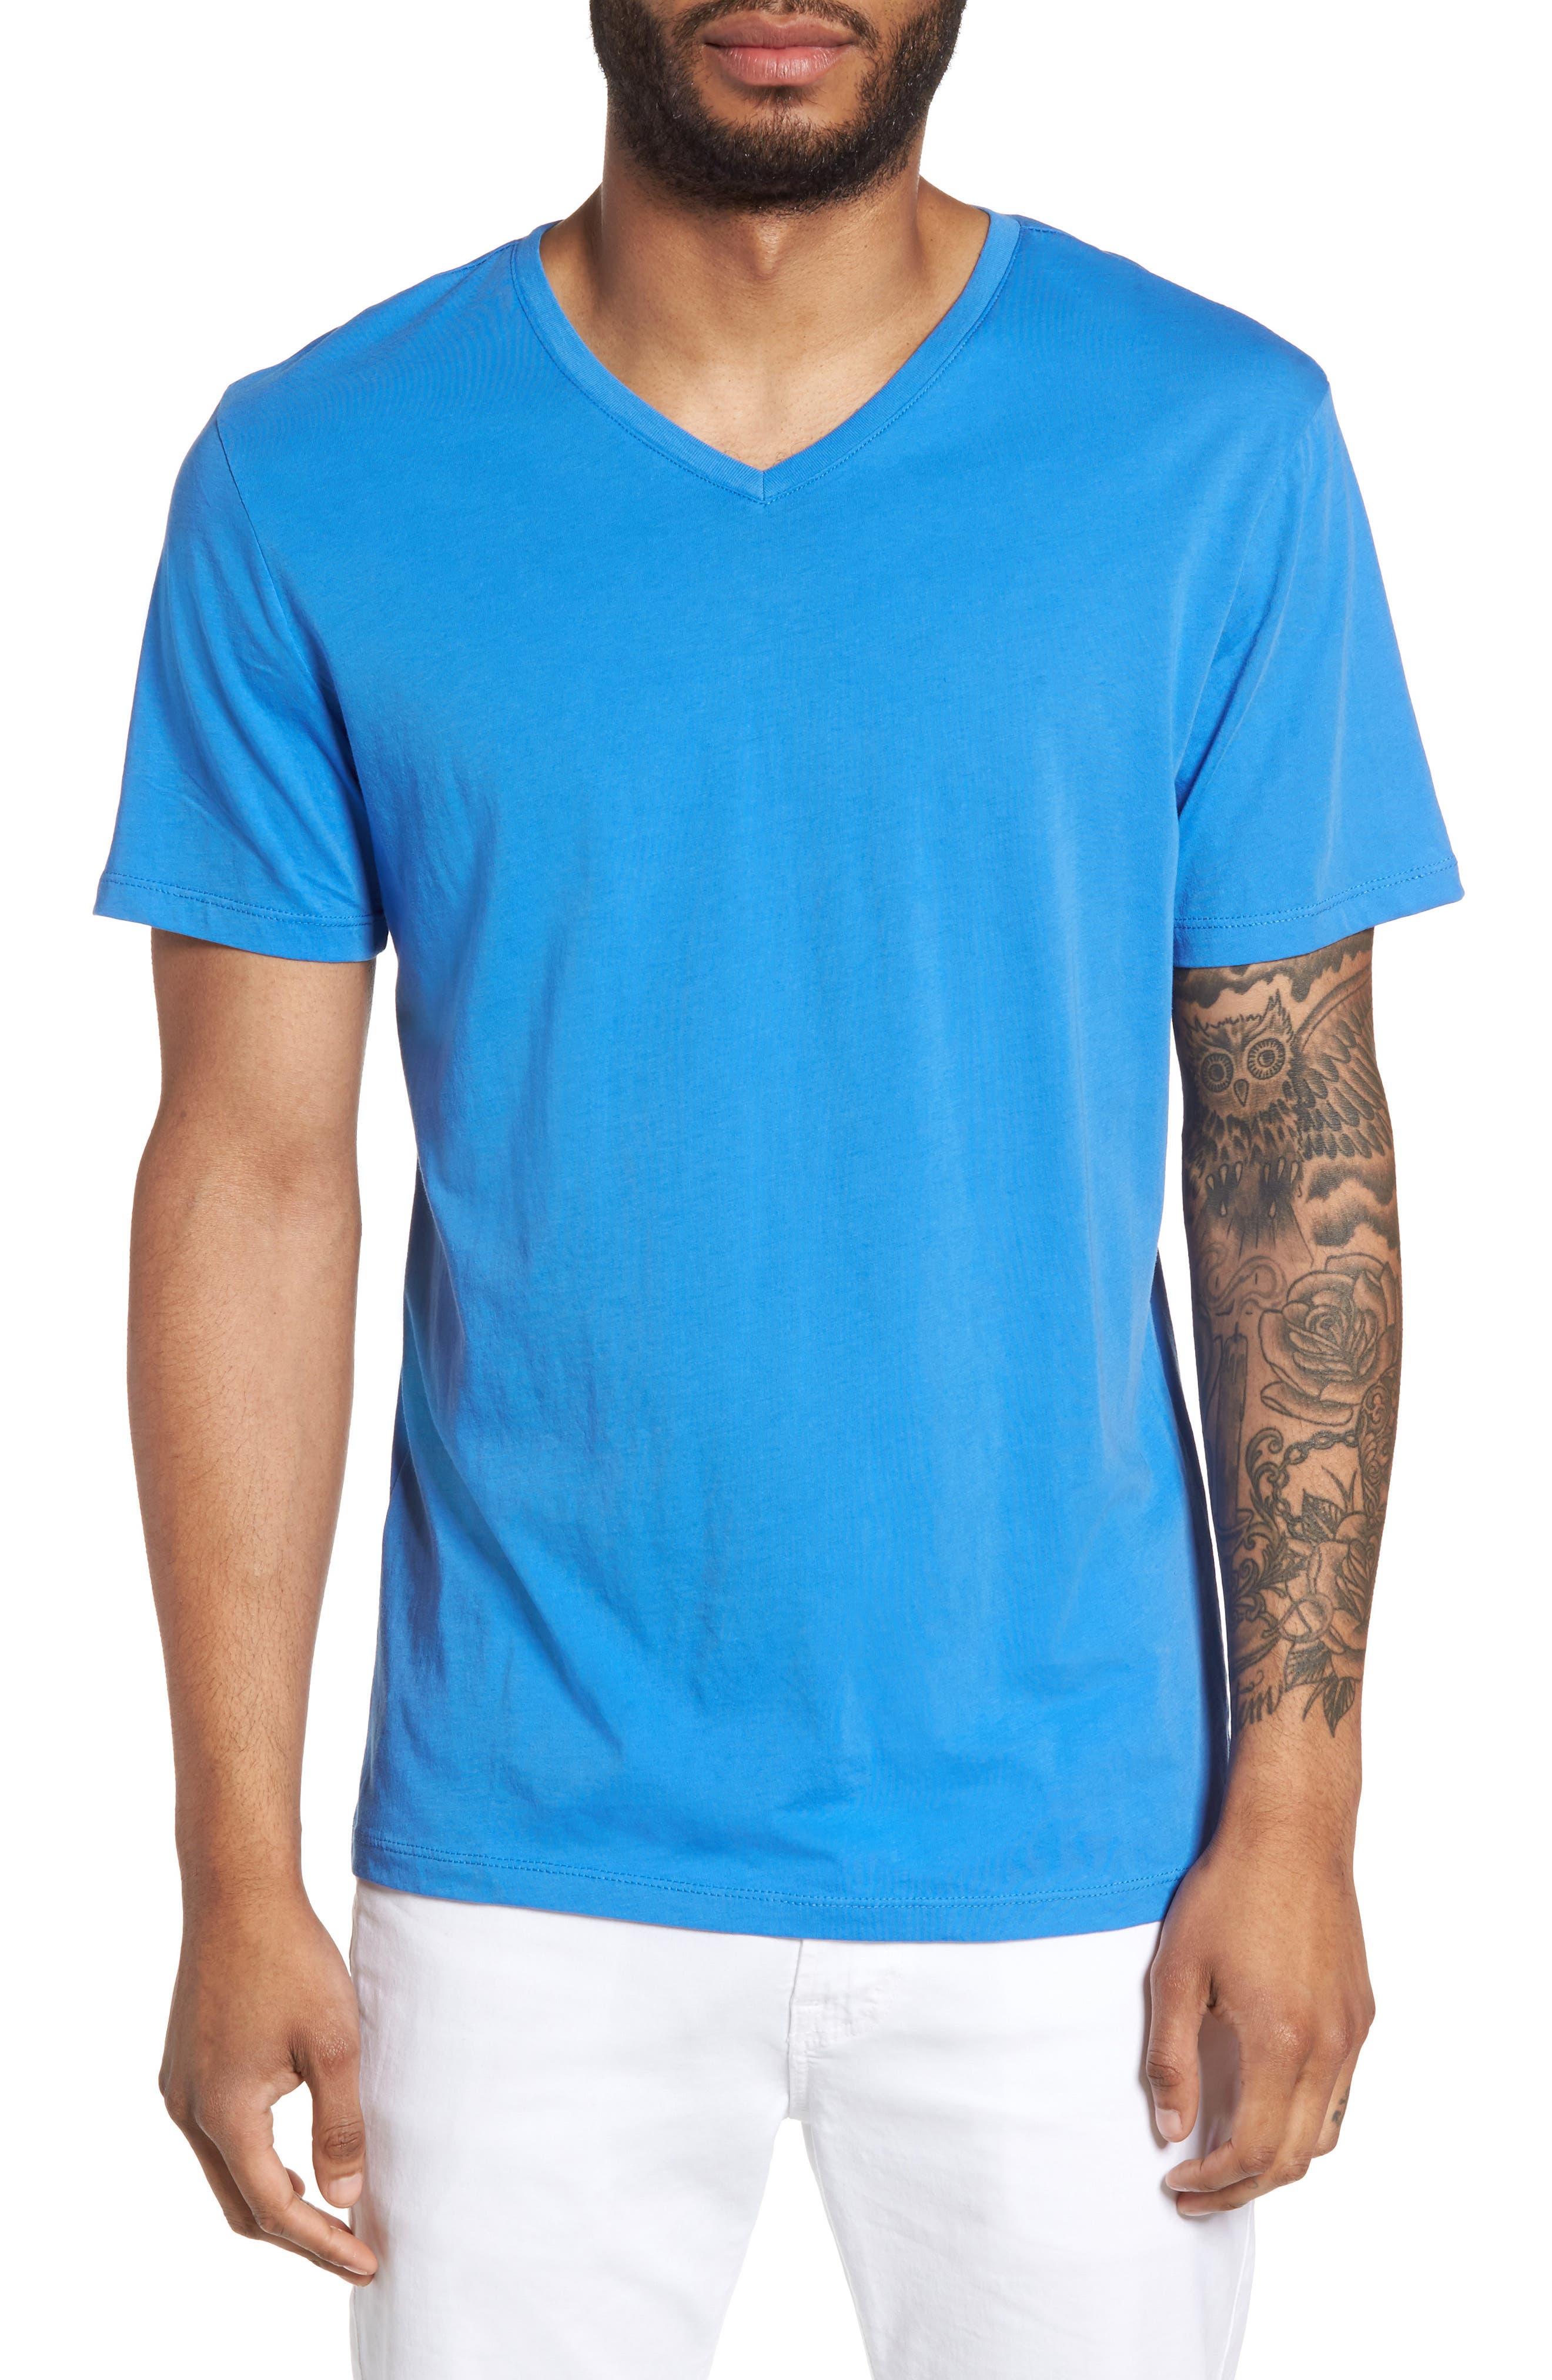 Main Image - Slate & Stone Slim V-Neck T-Shirt